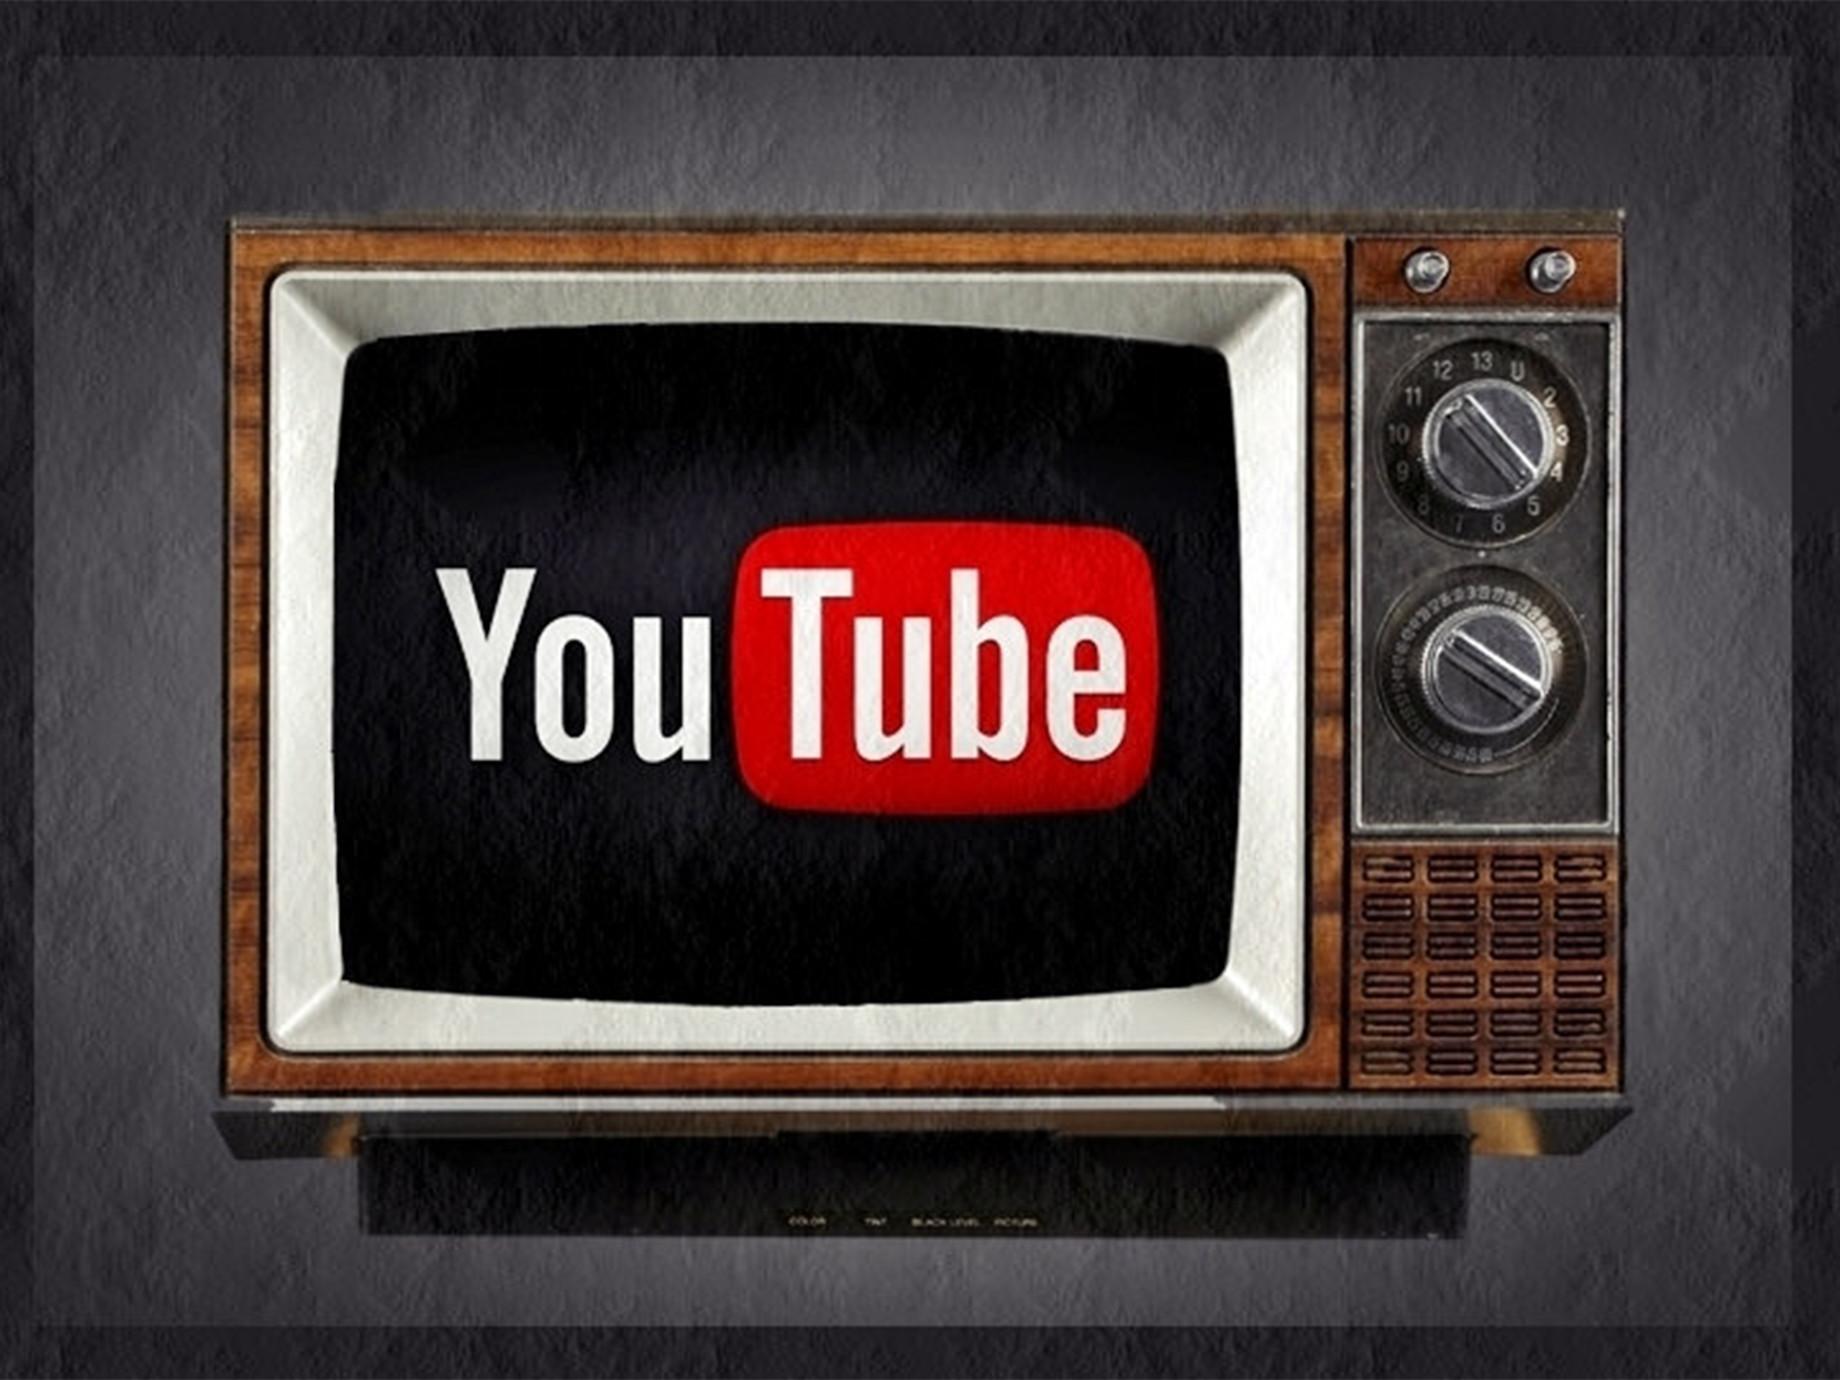 Youtube每日觀看時數破10億,新推TV功能將電視節目搬上線